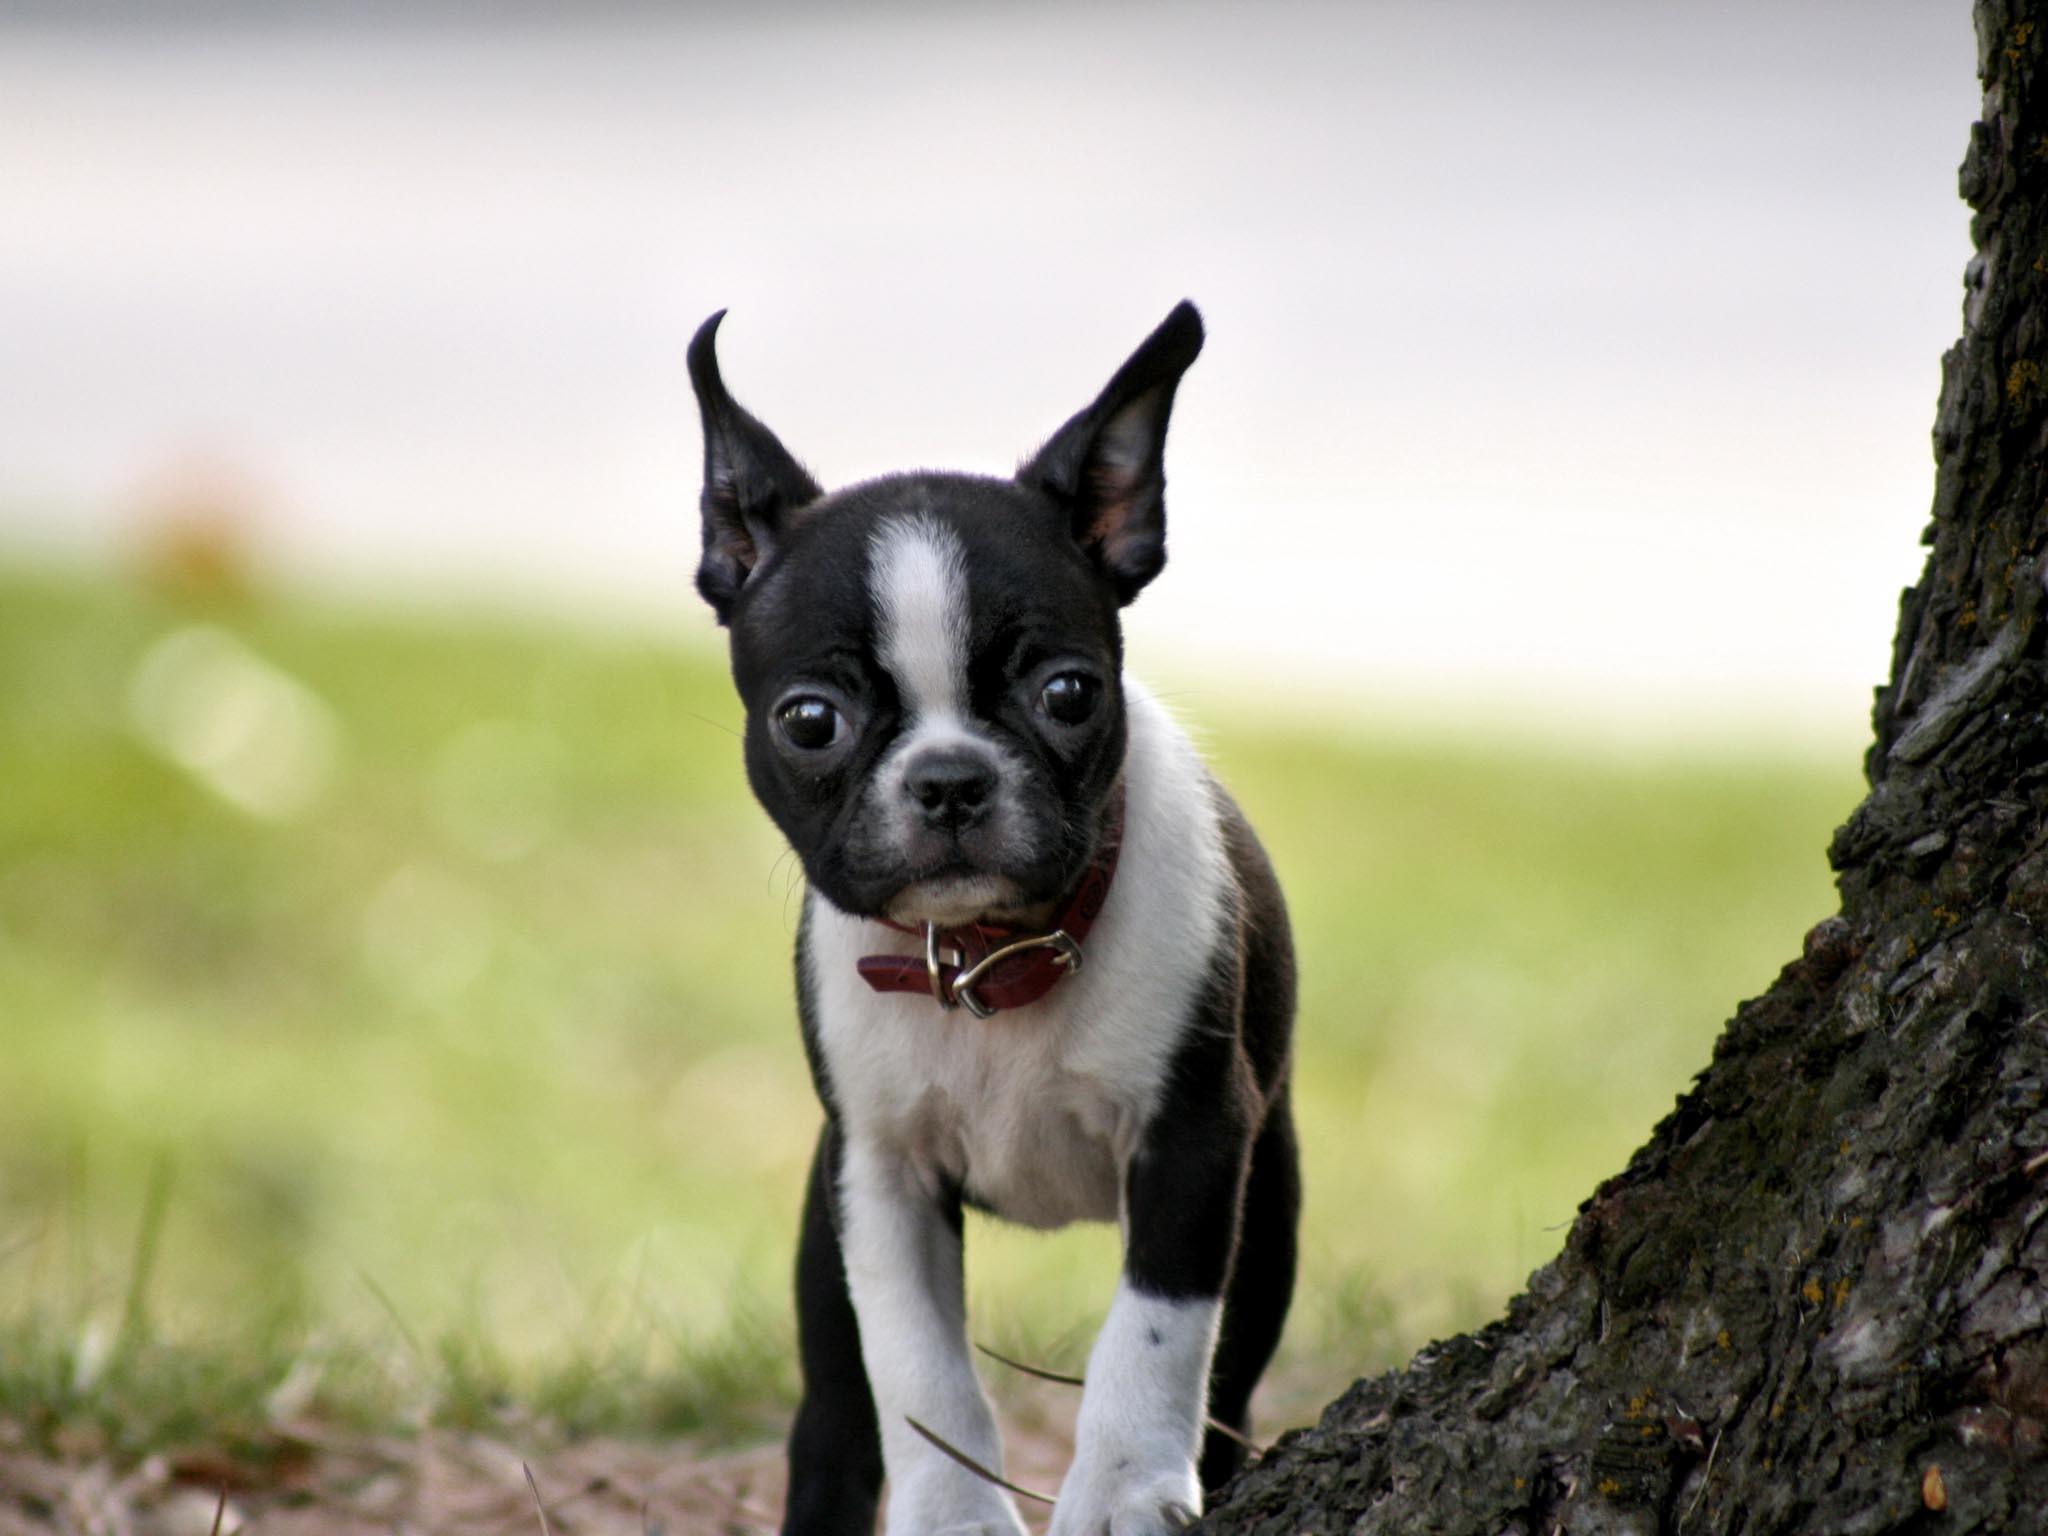 Boston Terrier Puppies – wallpaper. Boston Terrier Puppies – wallpaper. Pitbull  Dog Puppy HD Wallpapers